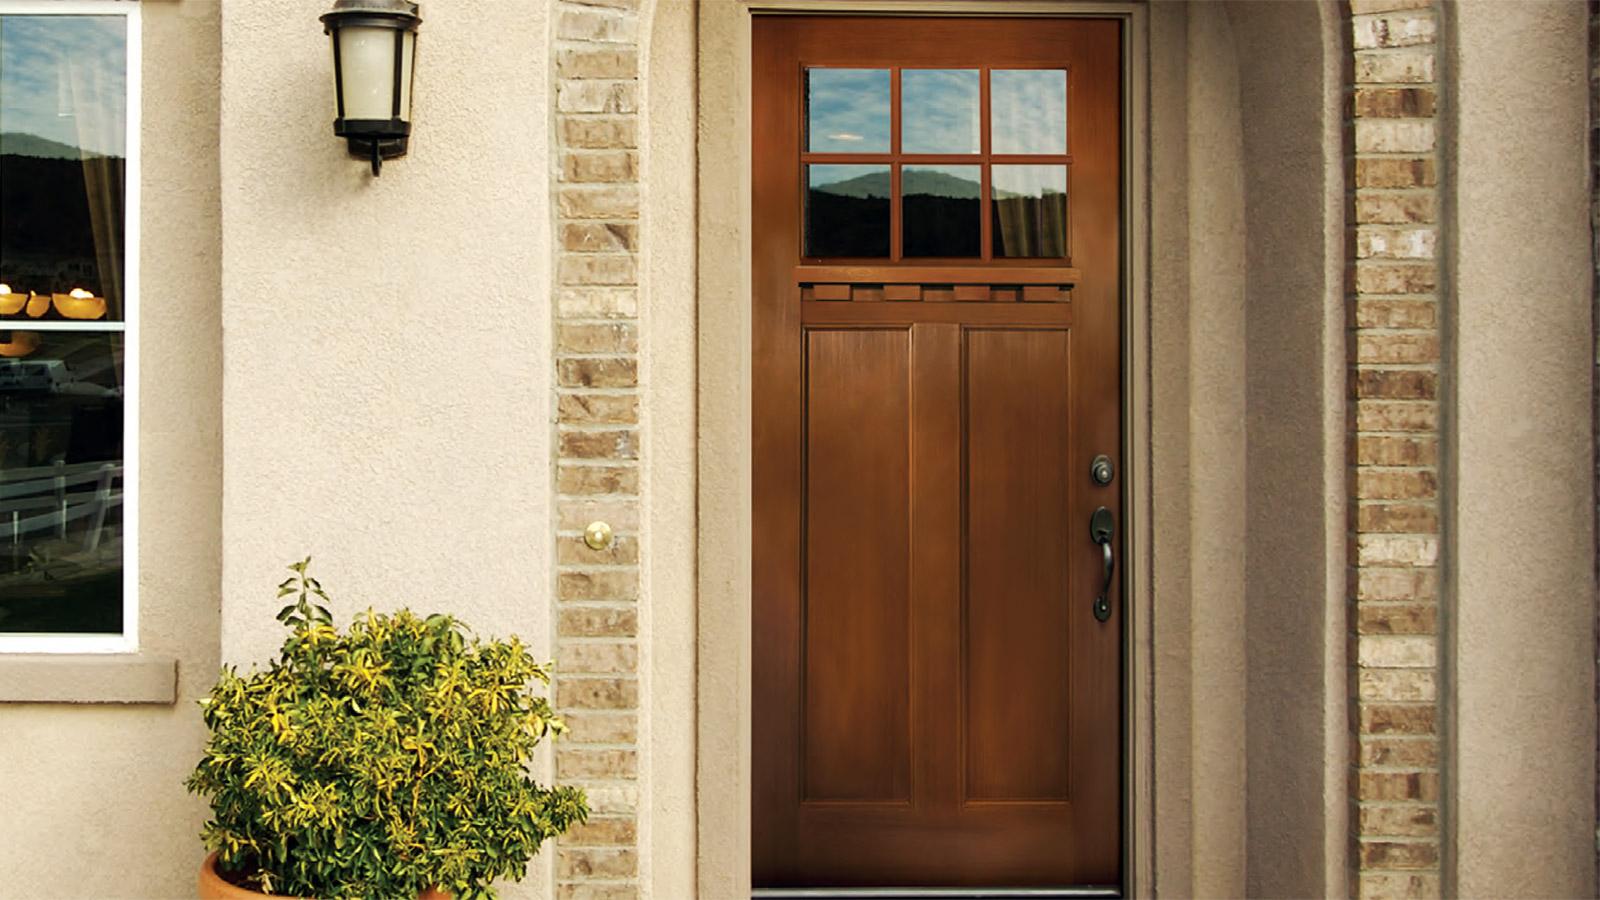 Energy Shield Window  Door Company Reviews from Customers